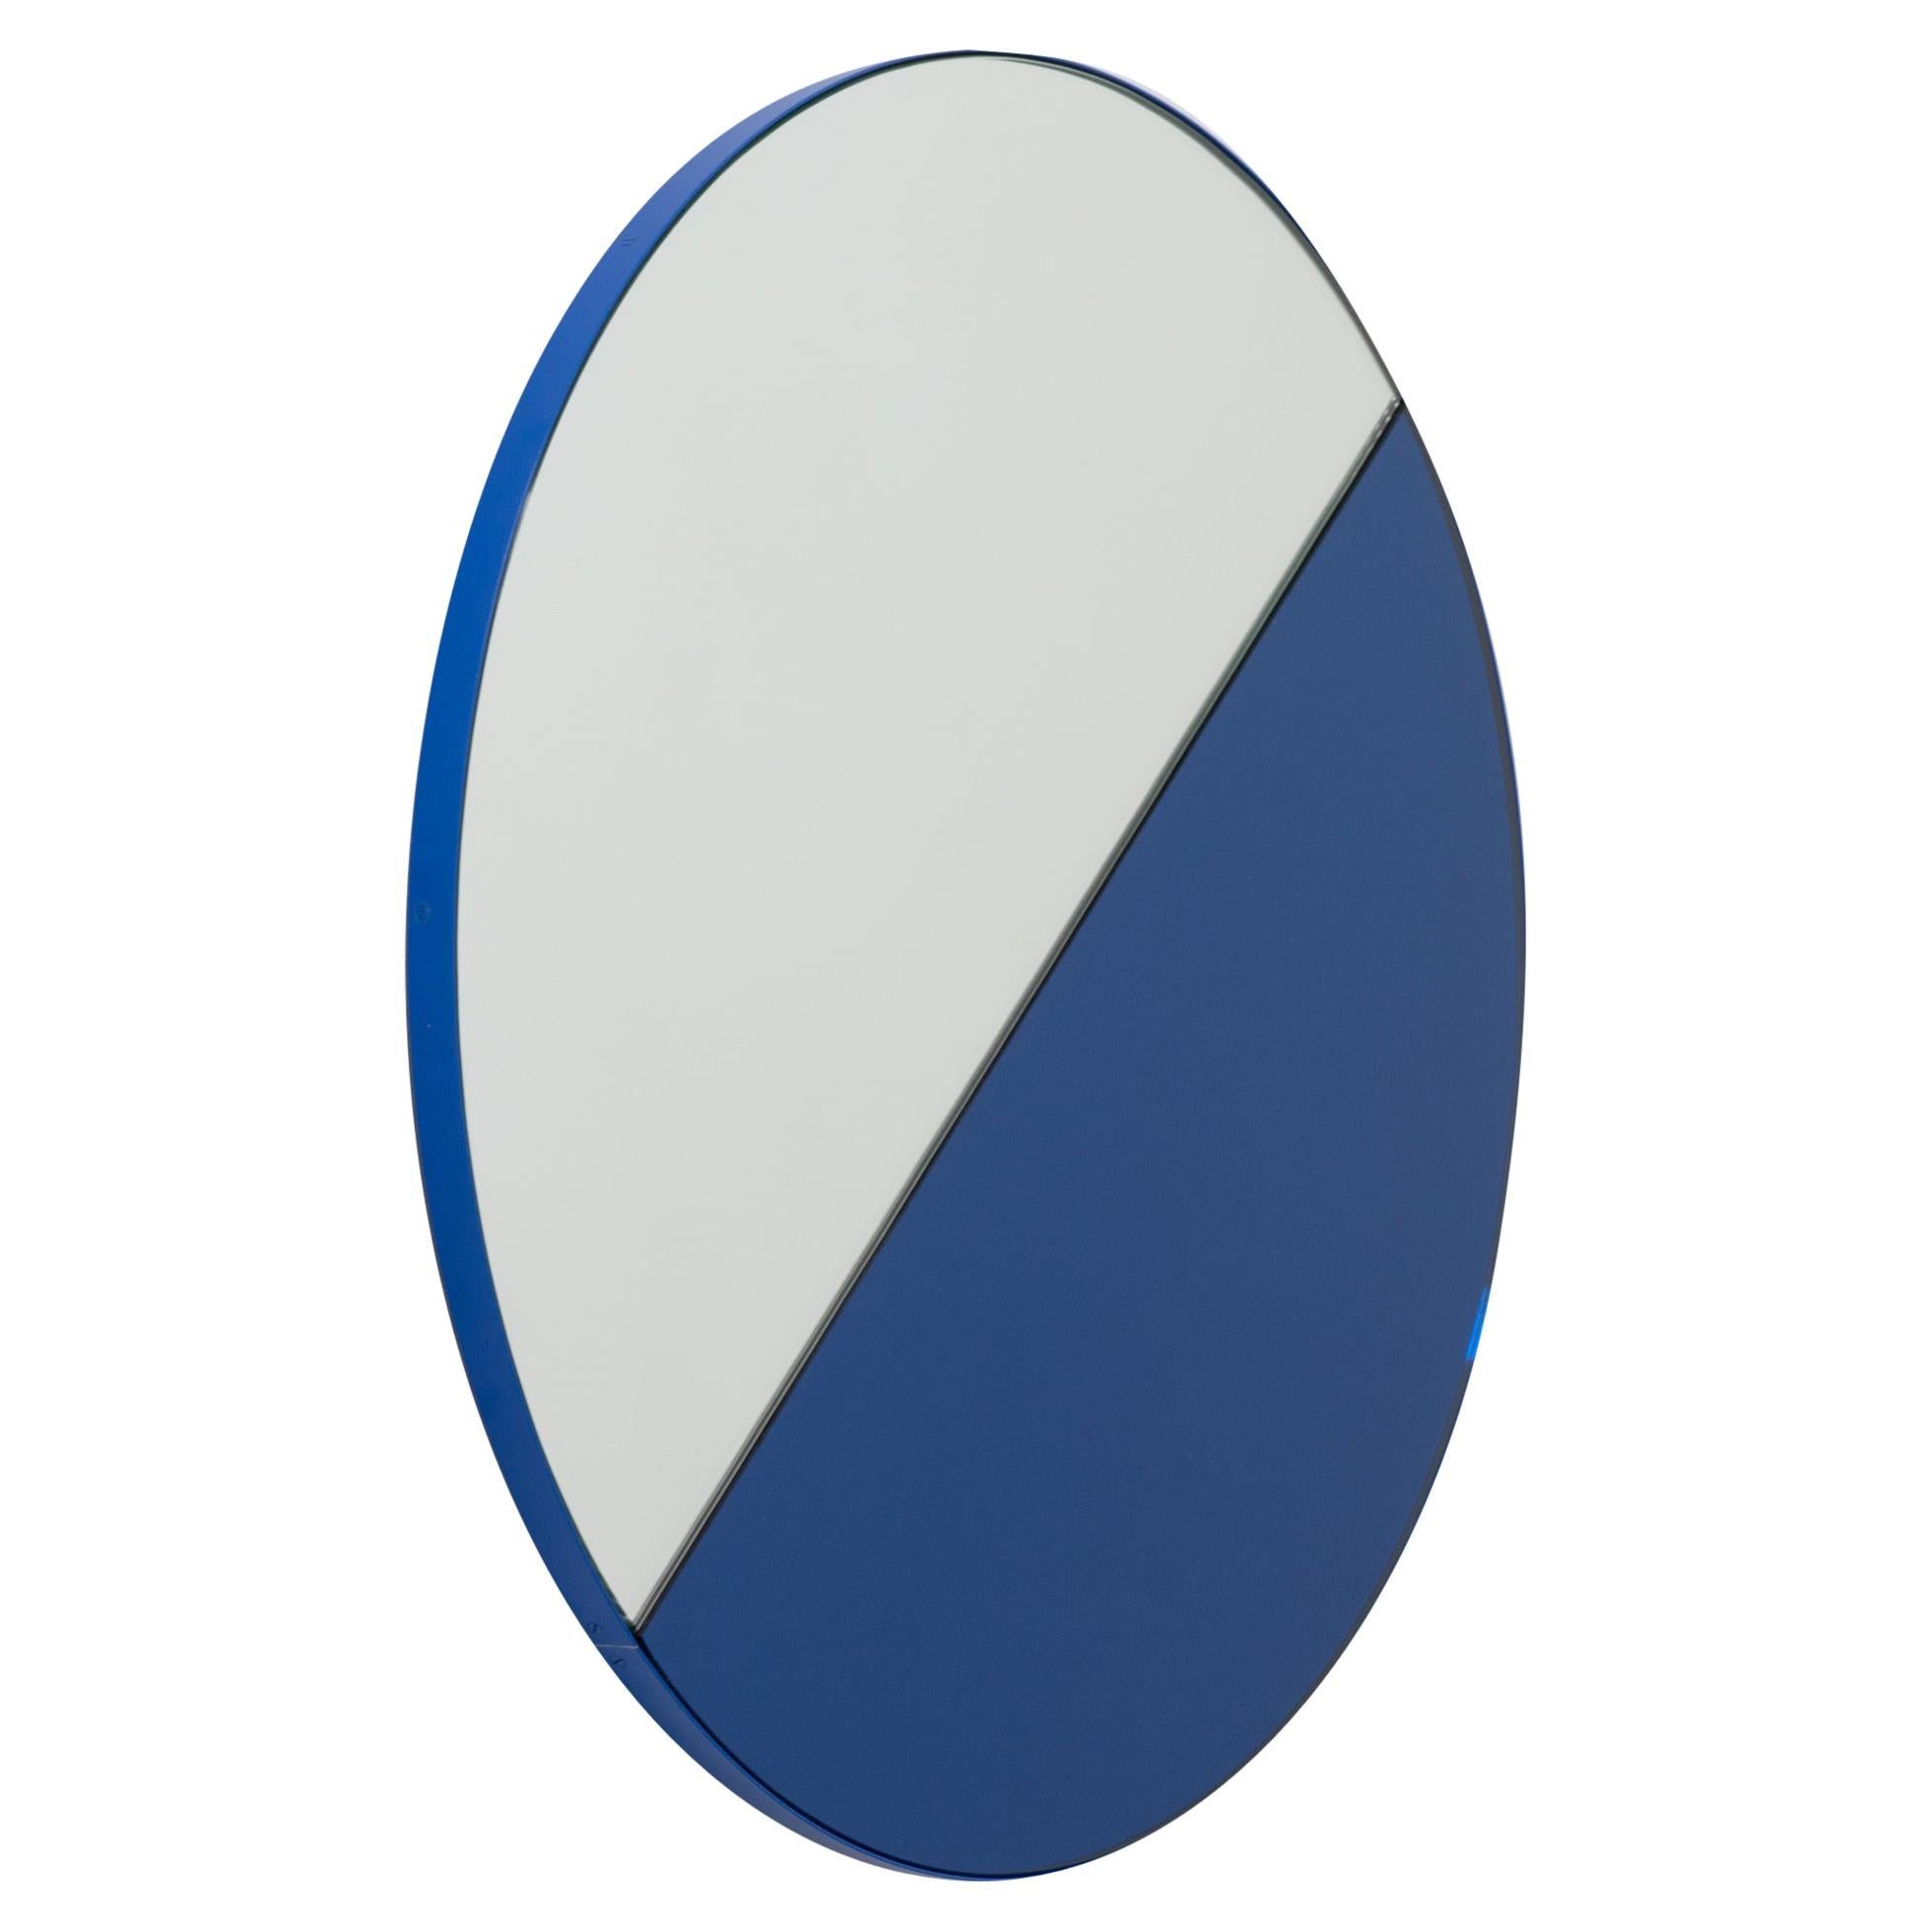 Orbis Dualis Mixed Tint 'Blue + Silver' Round Mirror with Blue Frame, Medium